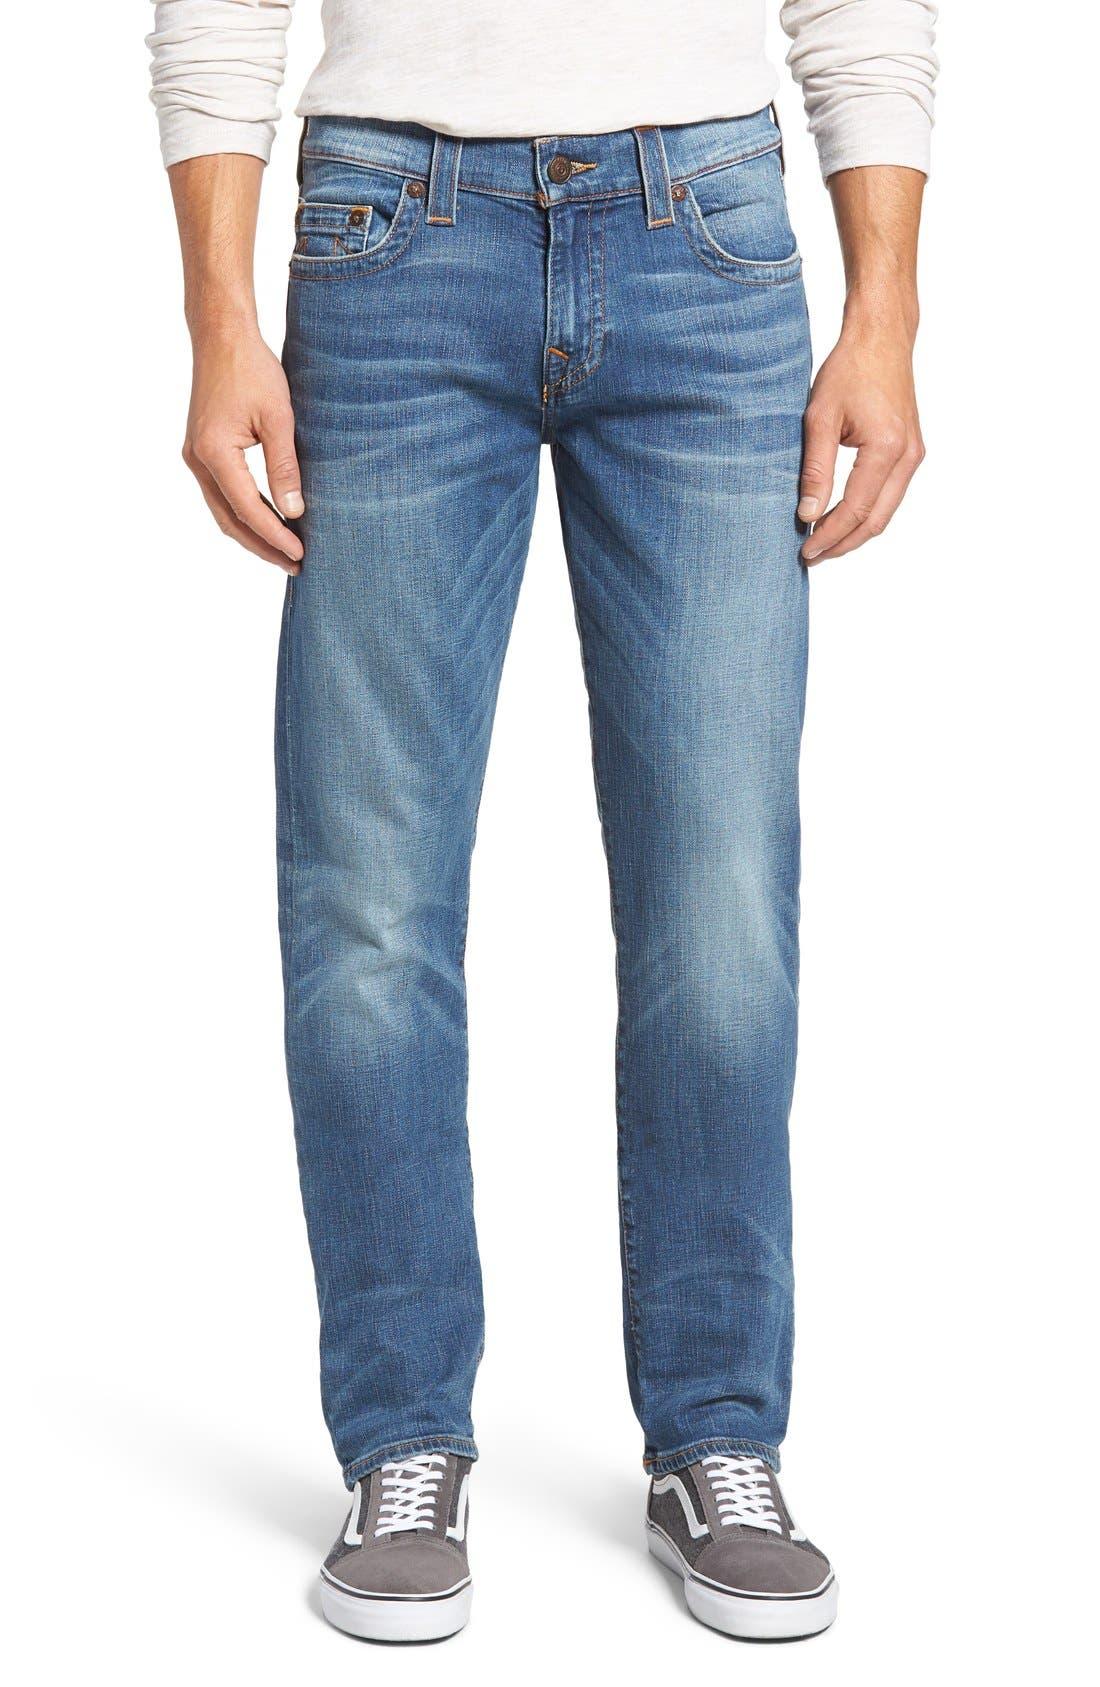 True Religion Brand Jeans Geno Straight Leg Jeans (CVIM Flagstone) (Regular & Big)